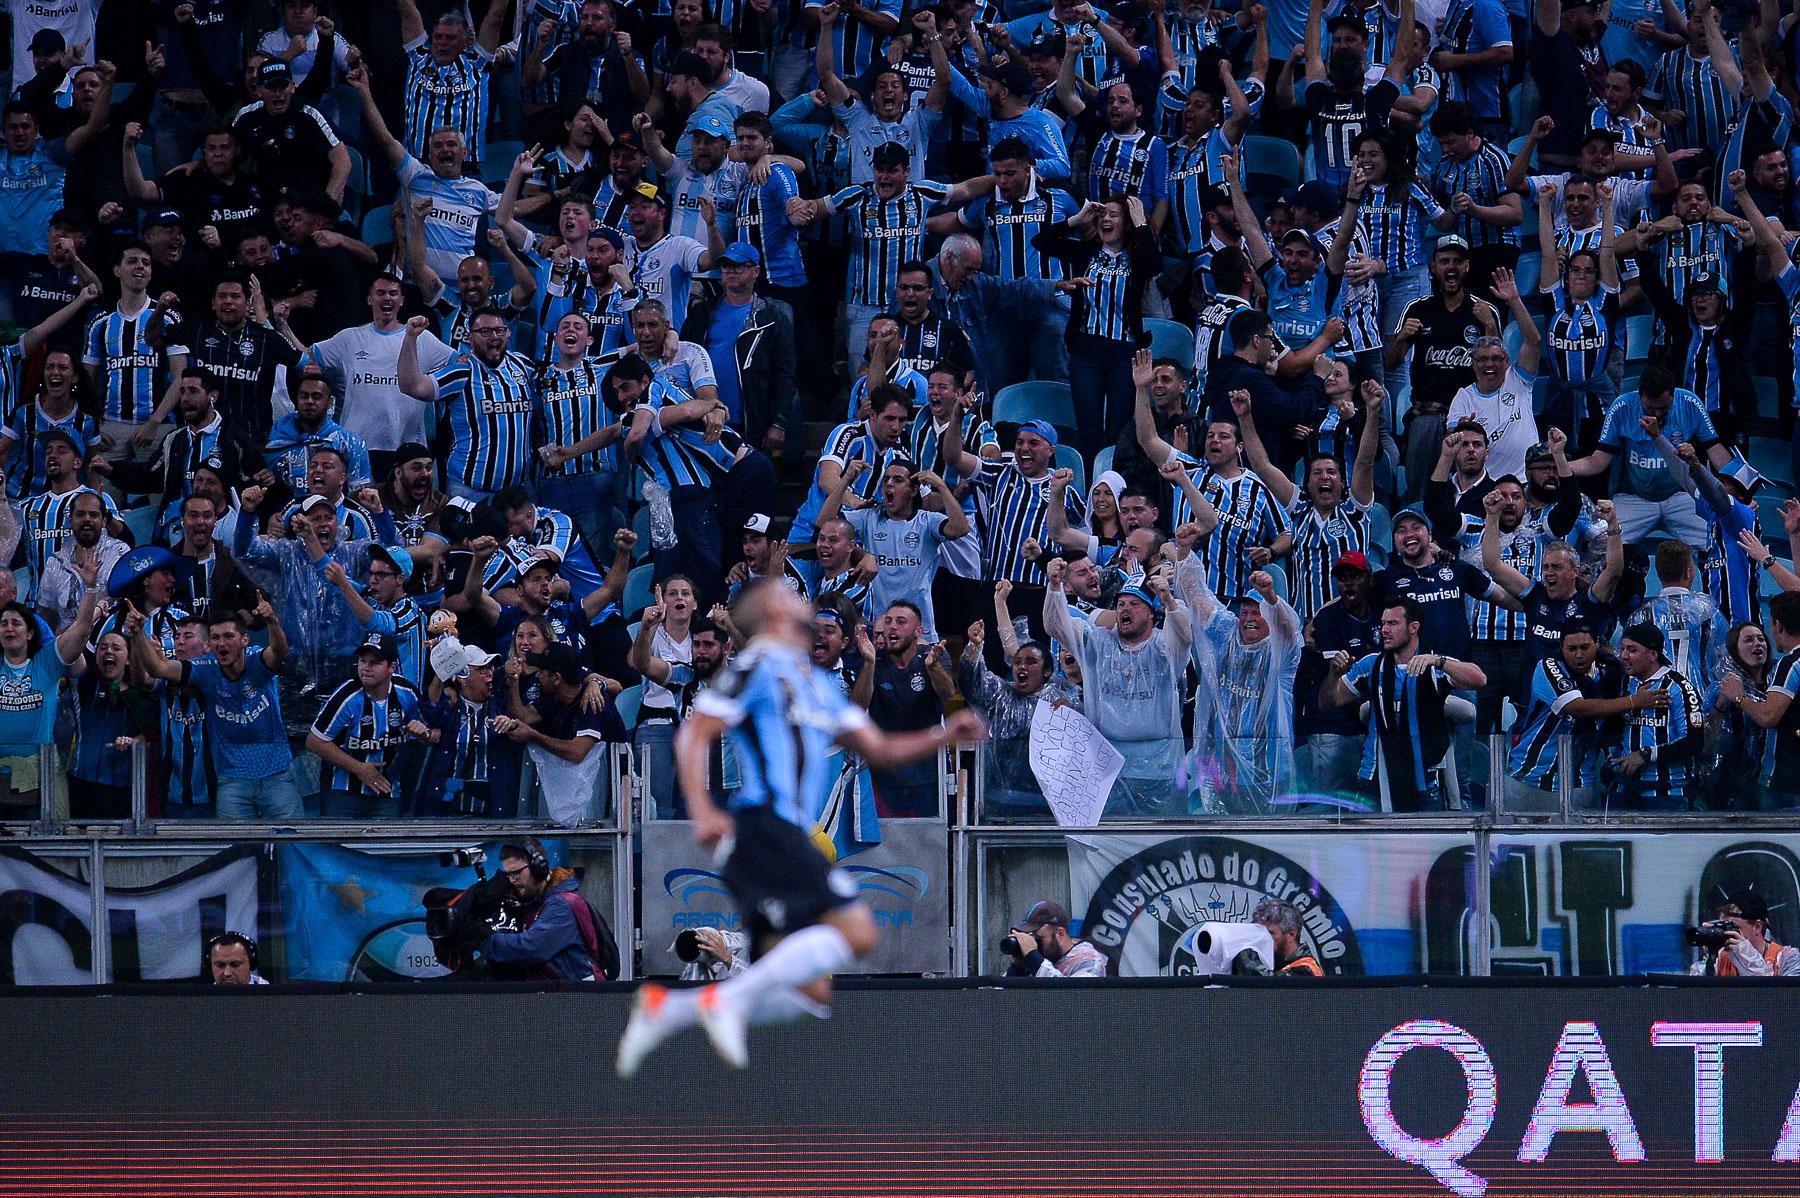 Gremio_X_Flamengo_dudabairros_Eleven_191